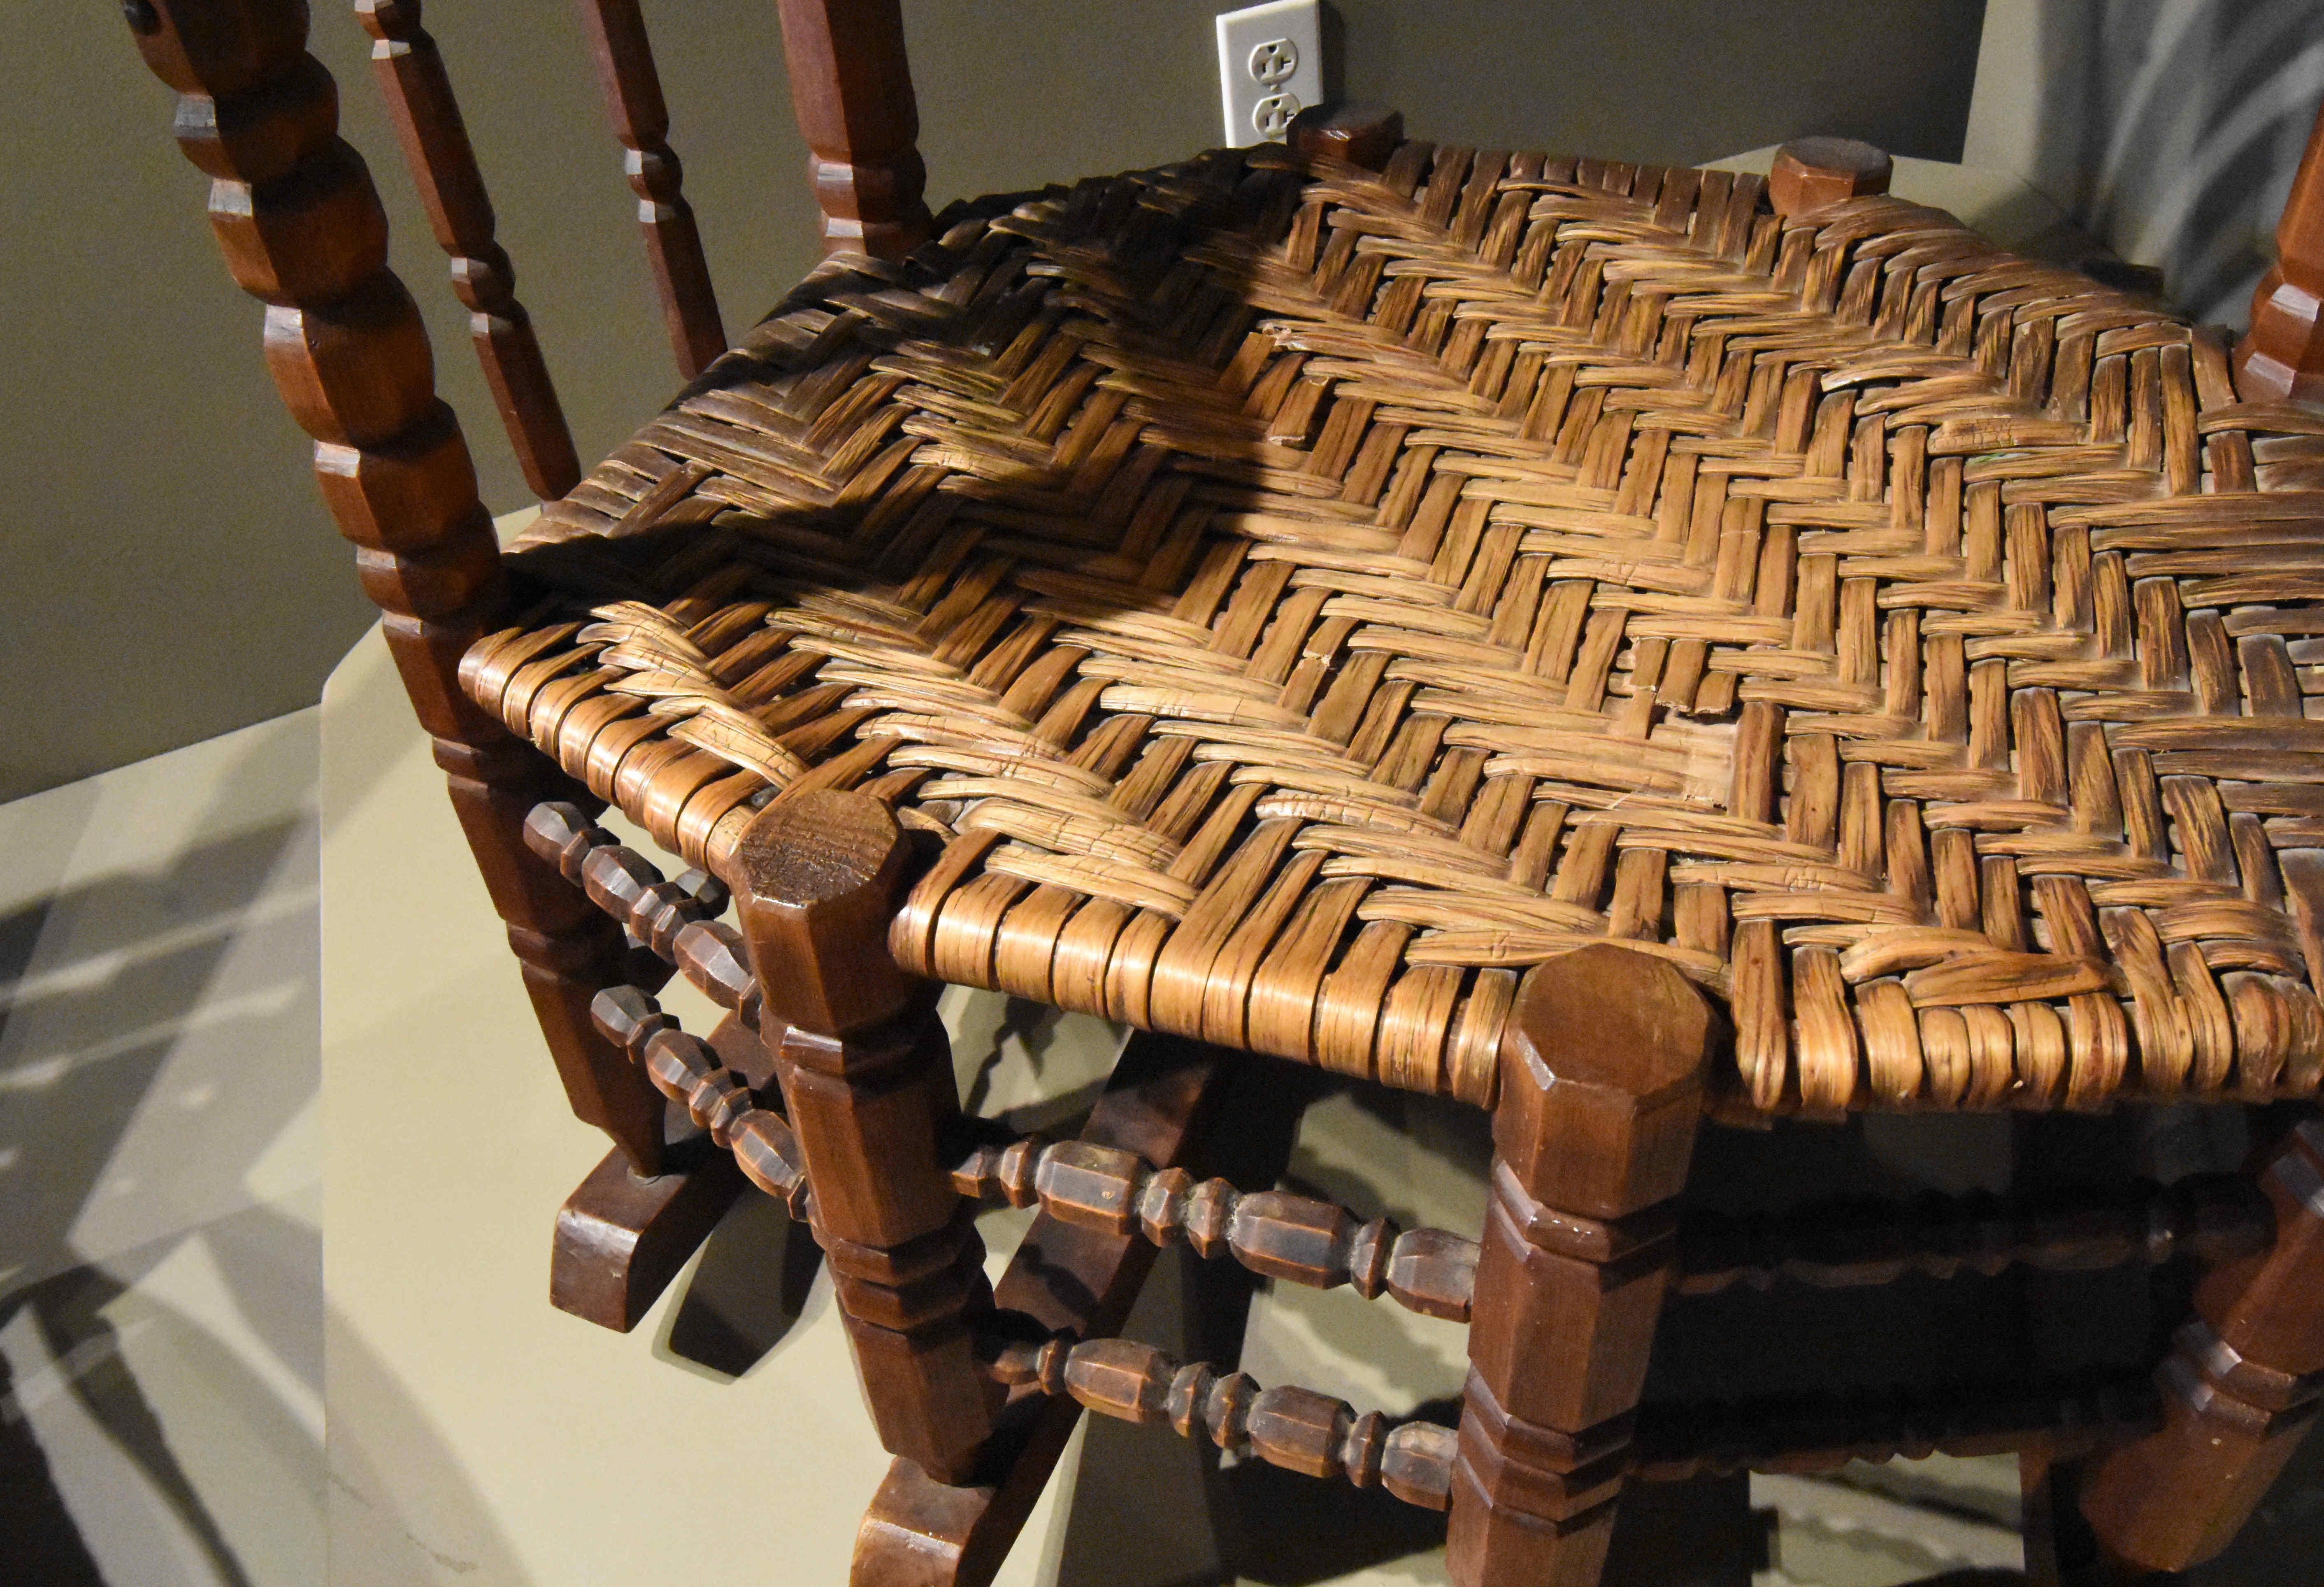 Marvelous Chester Cornett Chairs Peter Follansbee Joiners Notes Beatyapartments Chair Design Images Beatyapartmentscom